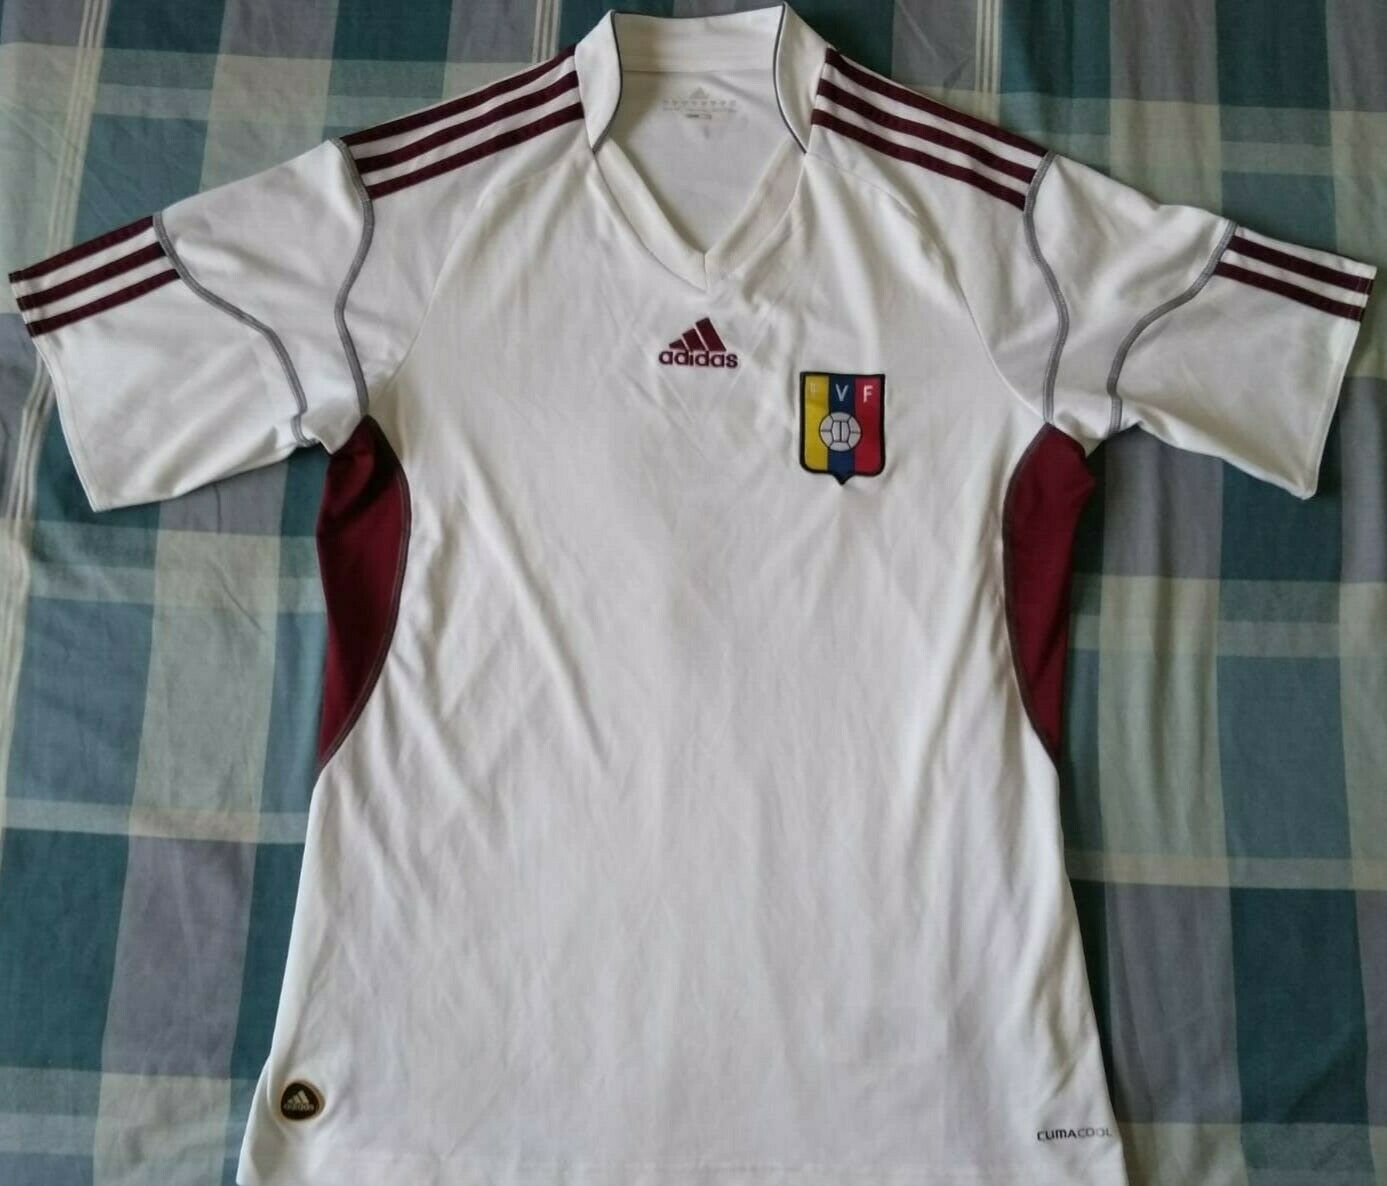 Camiseta Trikot Shirt VENEZUELA Adidas away Season 2012 Diuominiione M Vintage